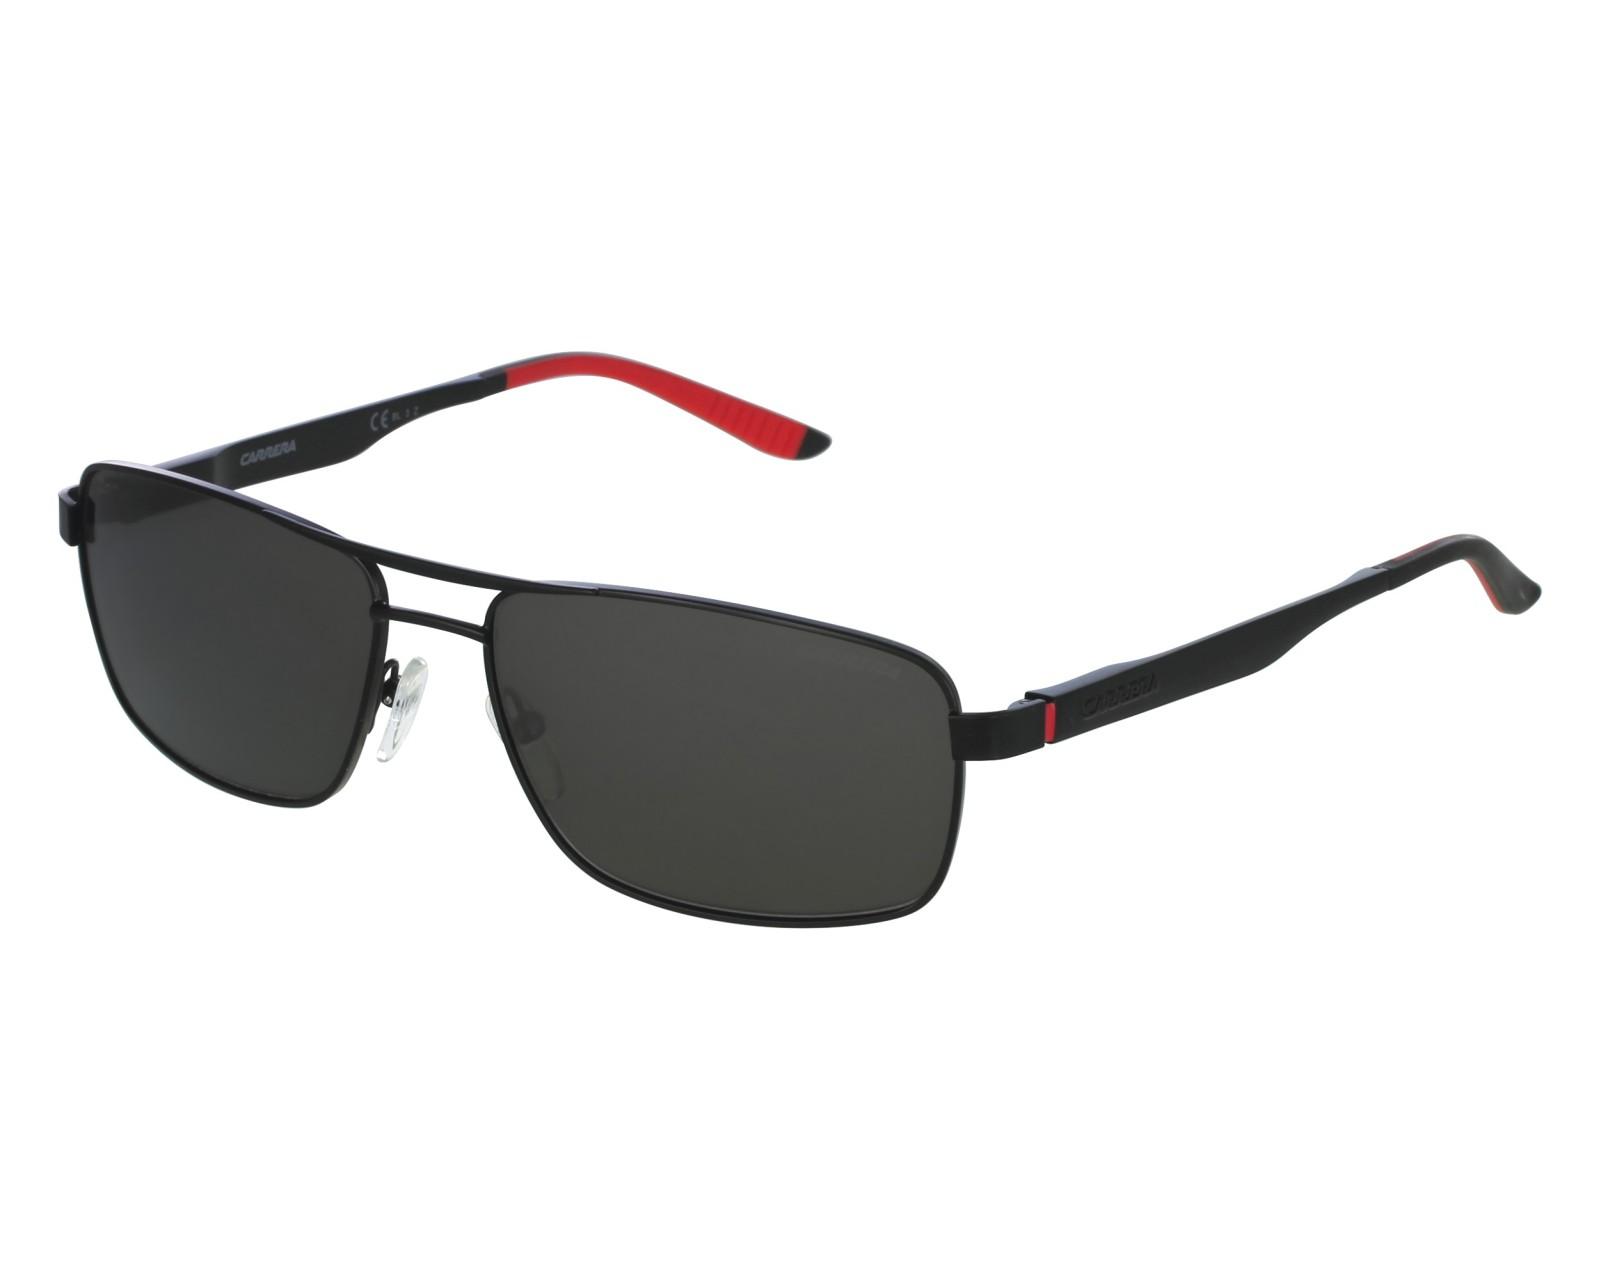 0c931fd347690 Sunglasses Carrera 8011-S 003 M9 - Black Red front view